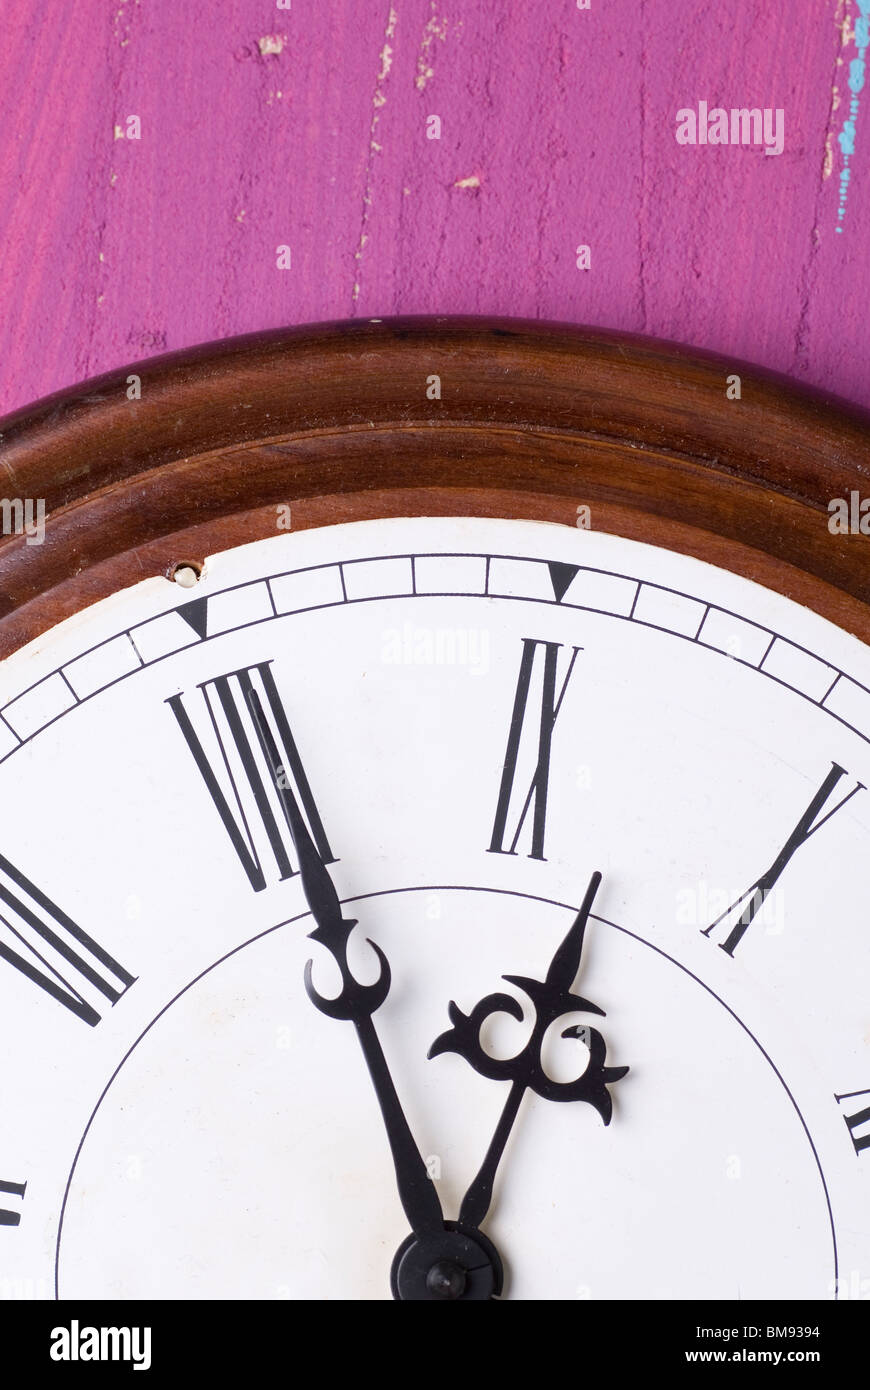 Primer plano de un viejo reloj de pared Imagen De Stock